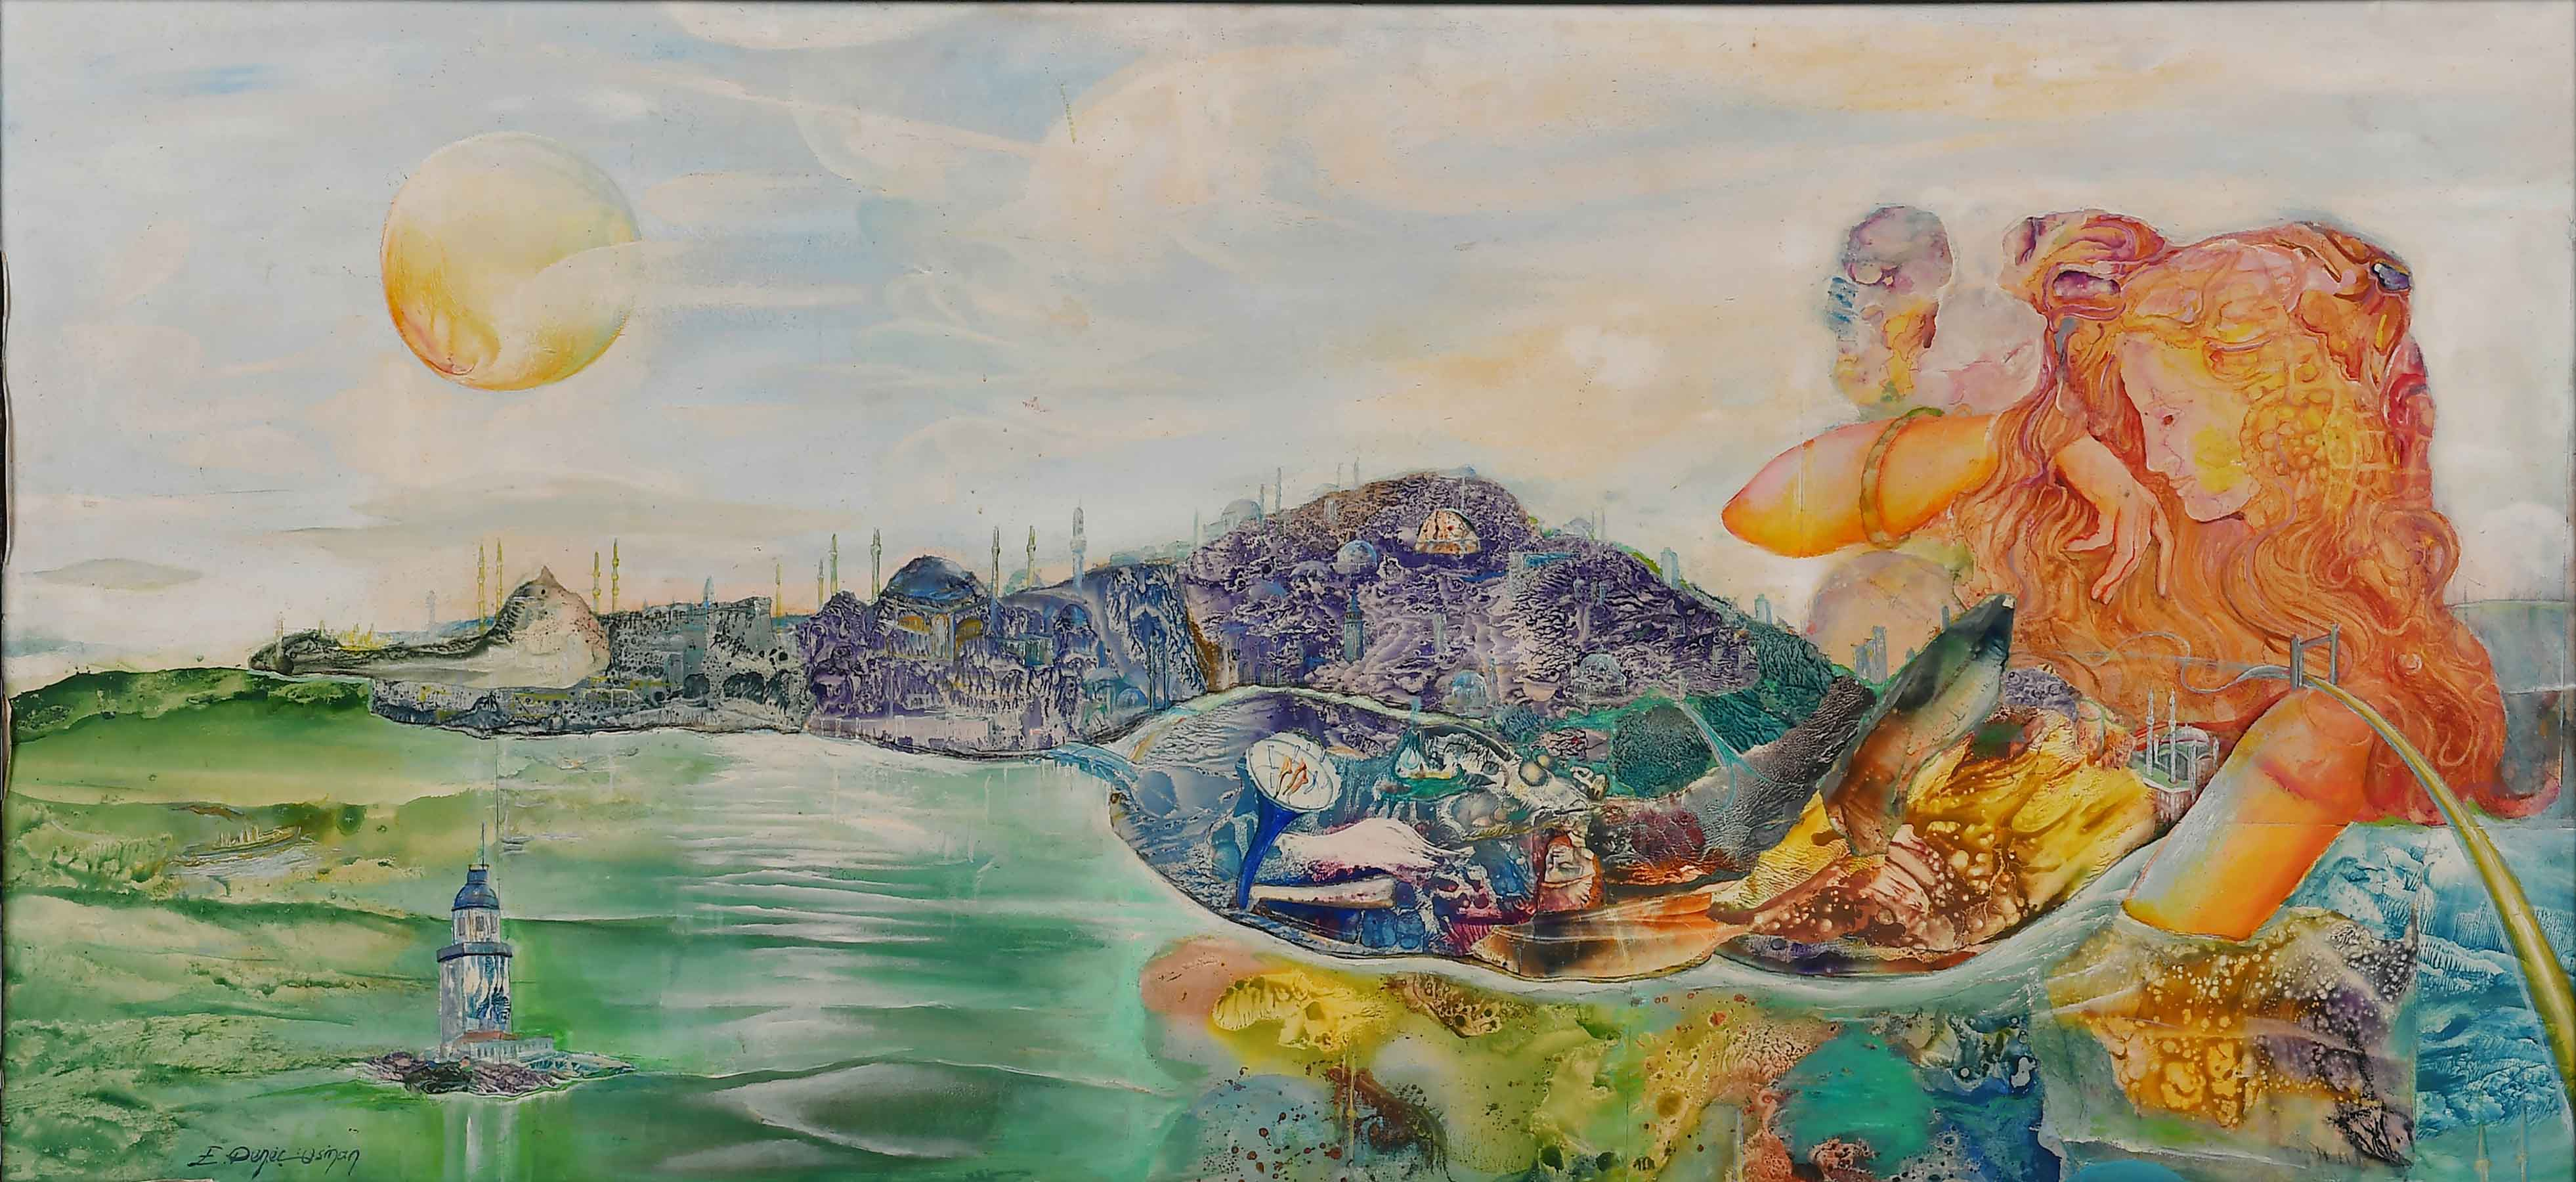 Erol Deneç - Fantastik Realizm Sergisi